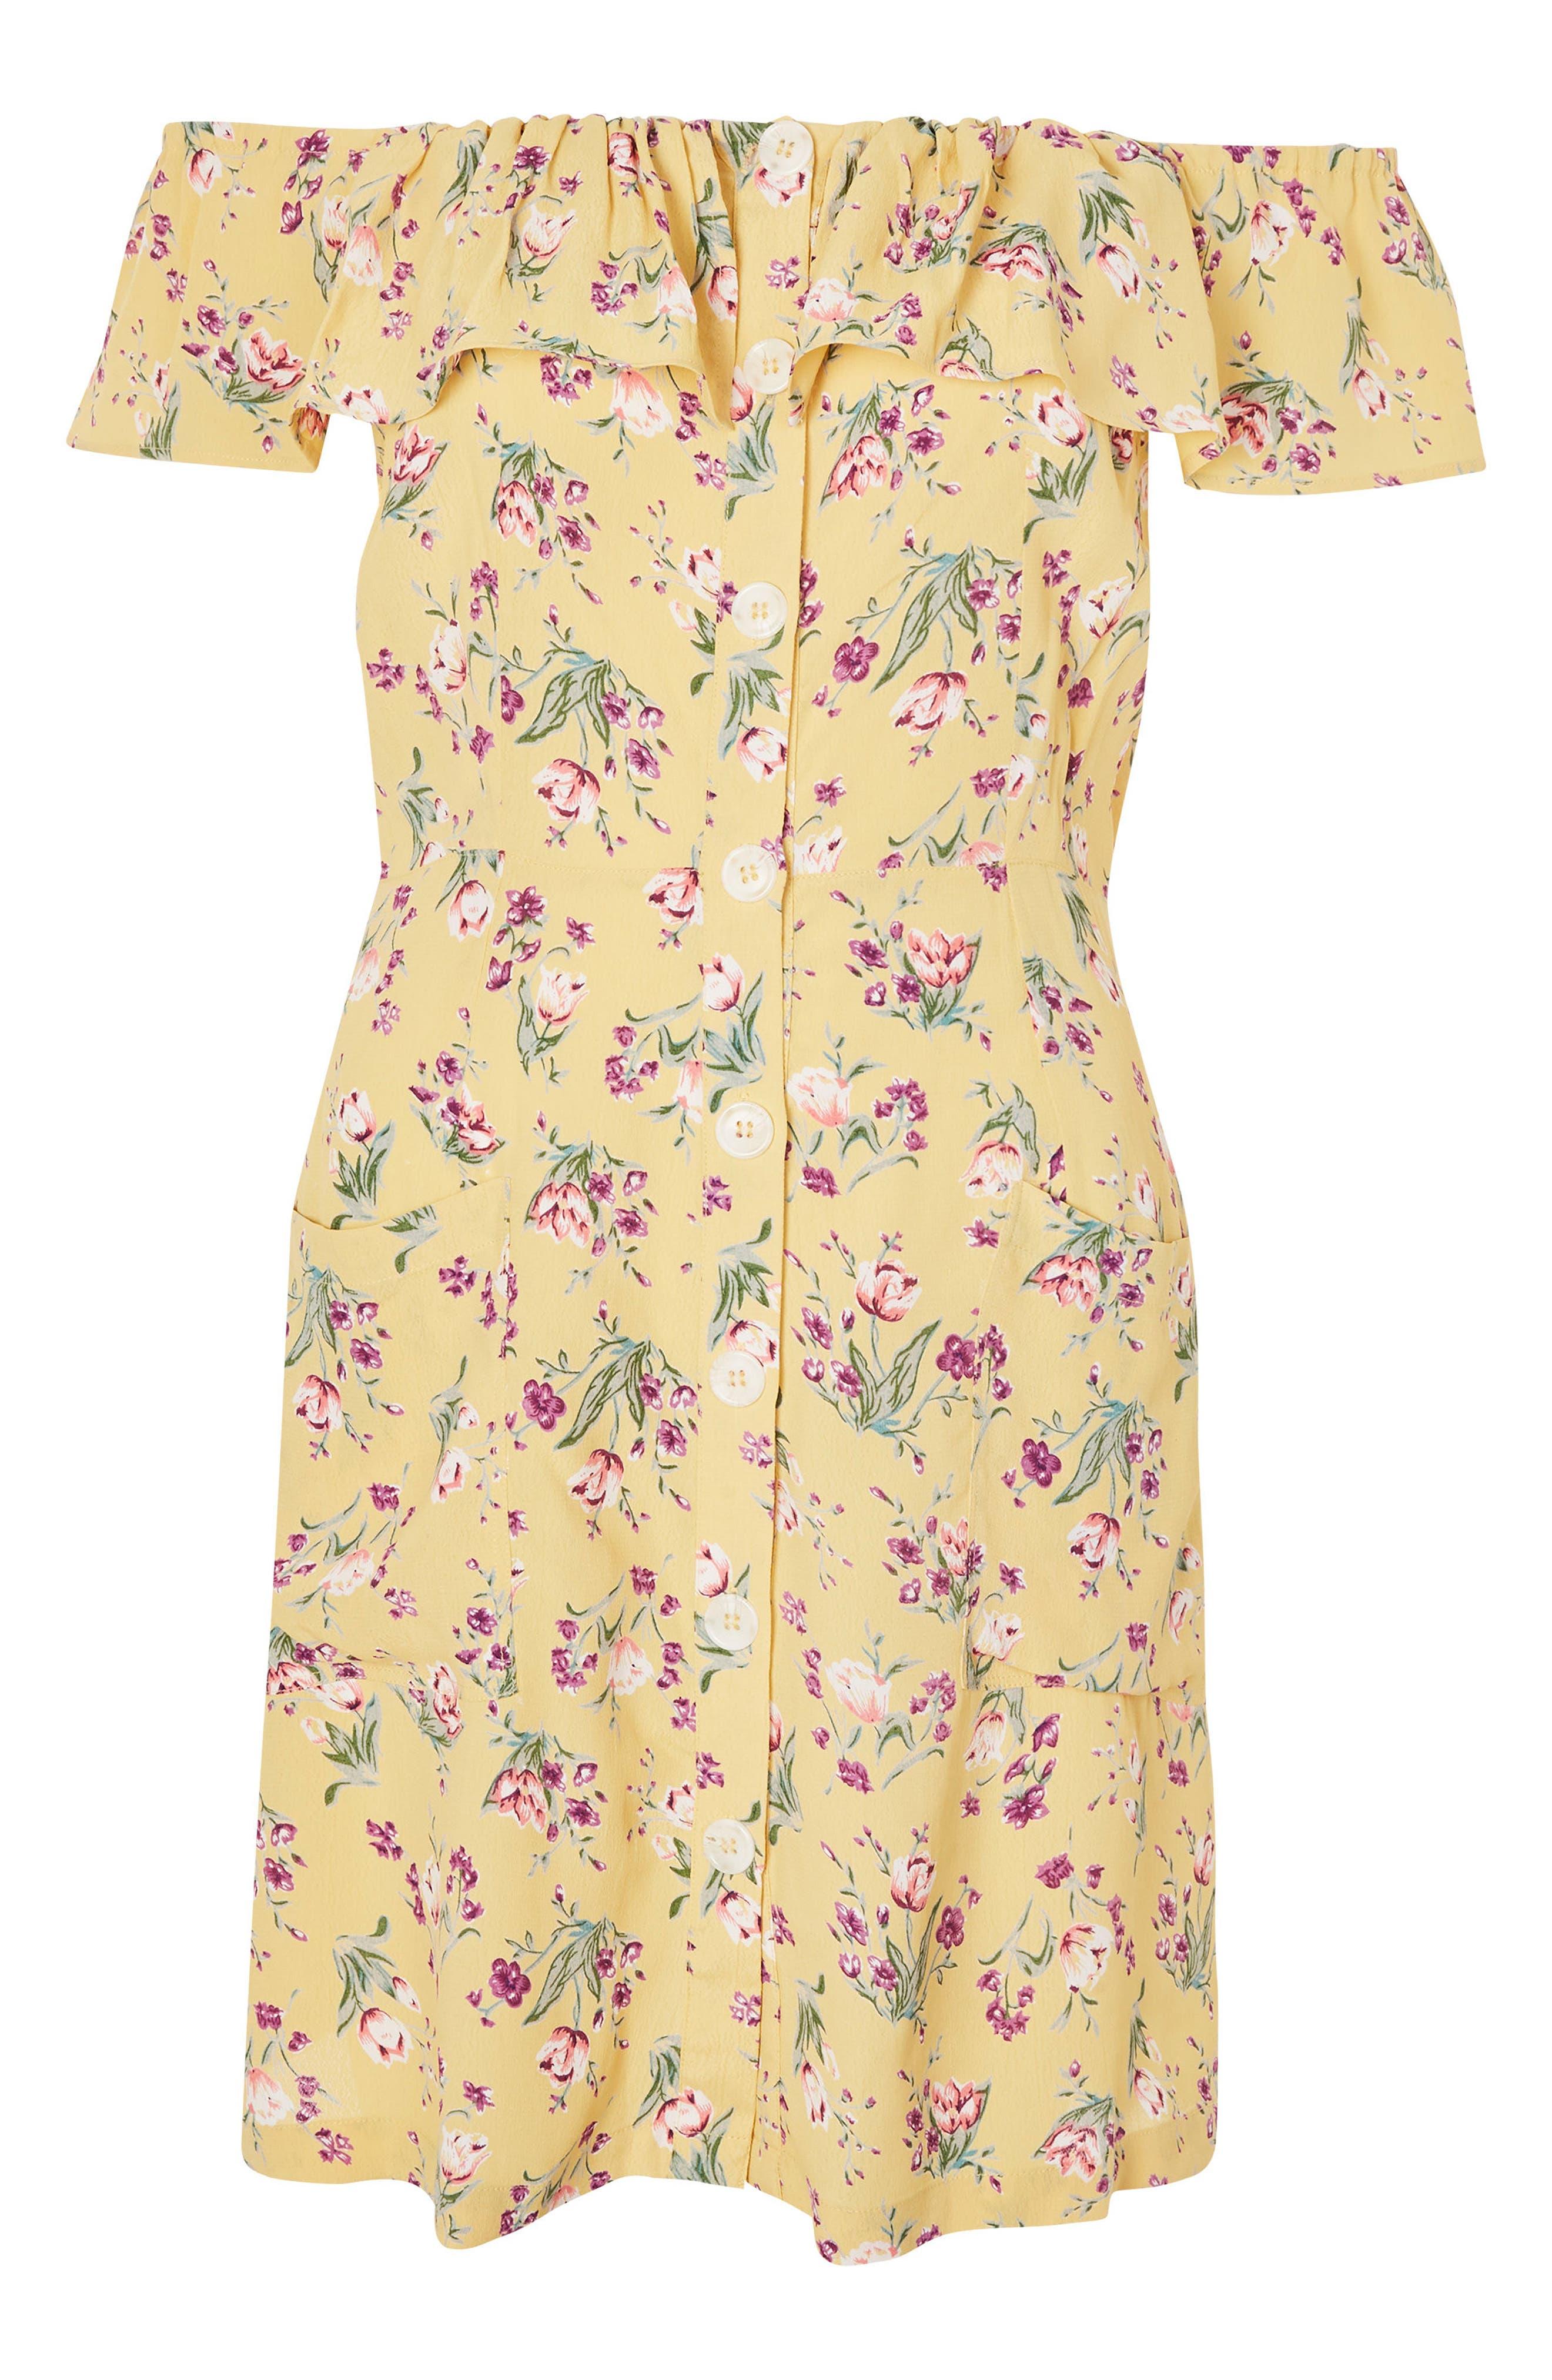 Spring Floral Minidress,                             Alternate thumbnail 4, color,                             Yellow Multi